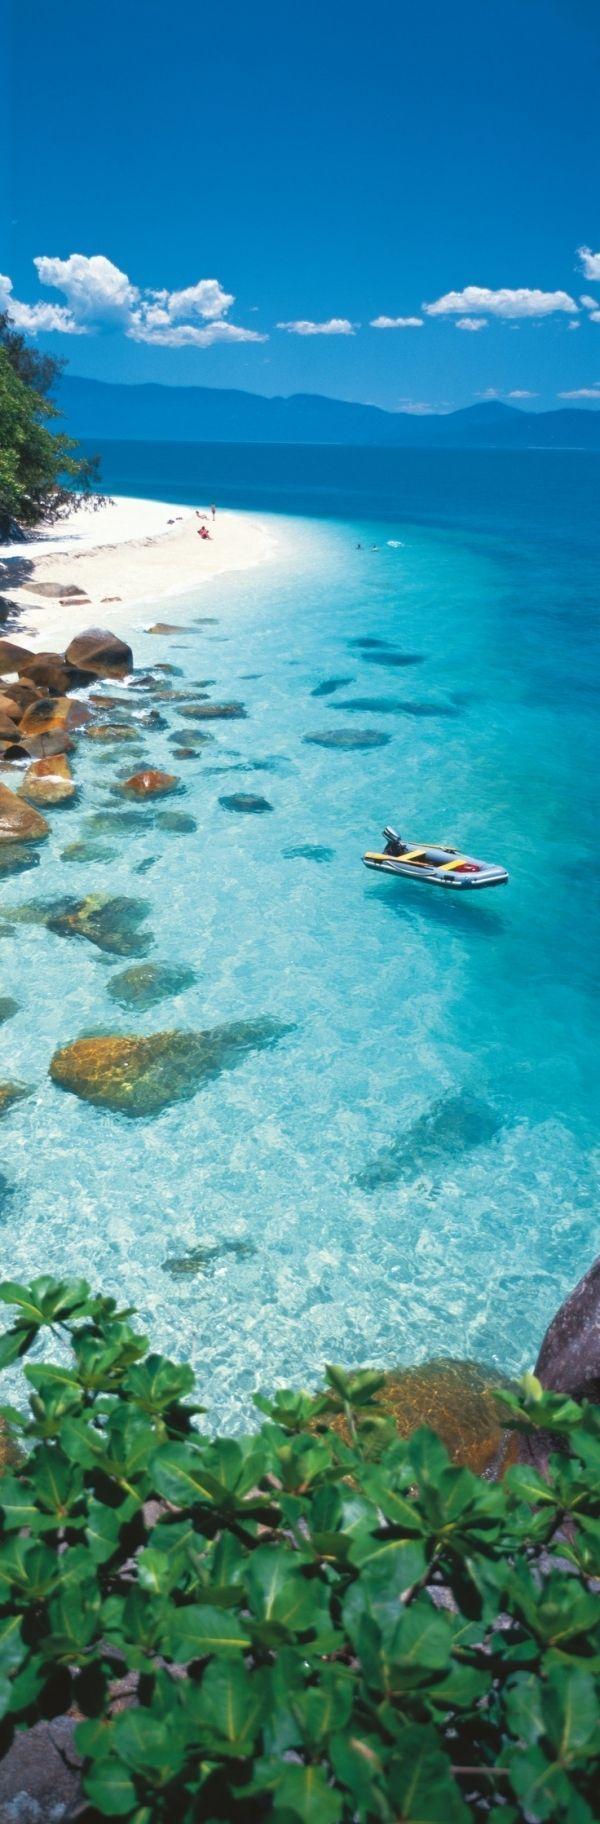 Boracay Adasi Turlari Boracay Balayi Otelleri Dalis Promosyon Seyahat Seyahat Tutkusu Goller